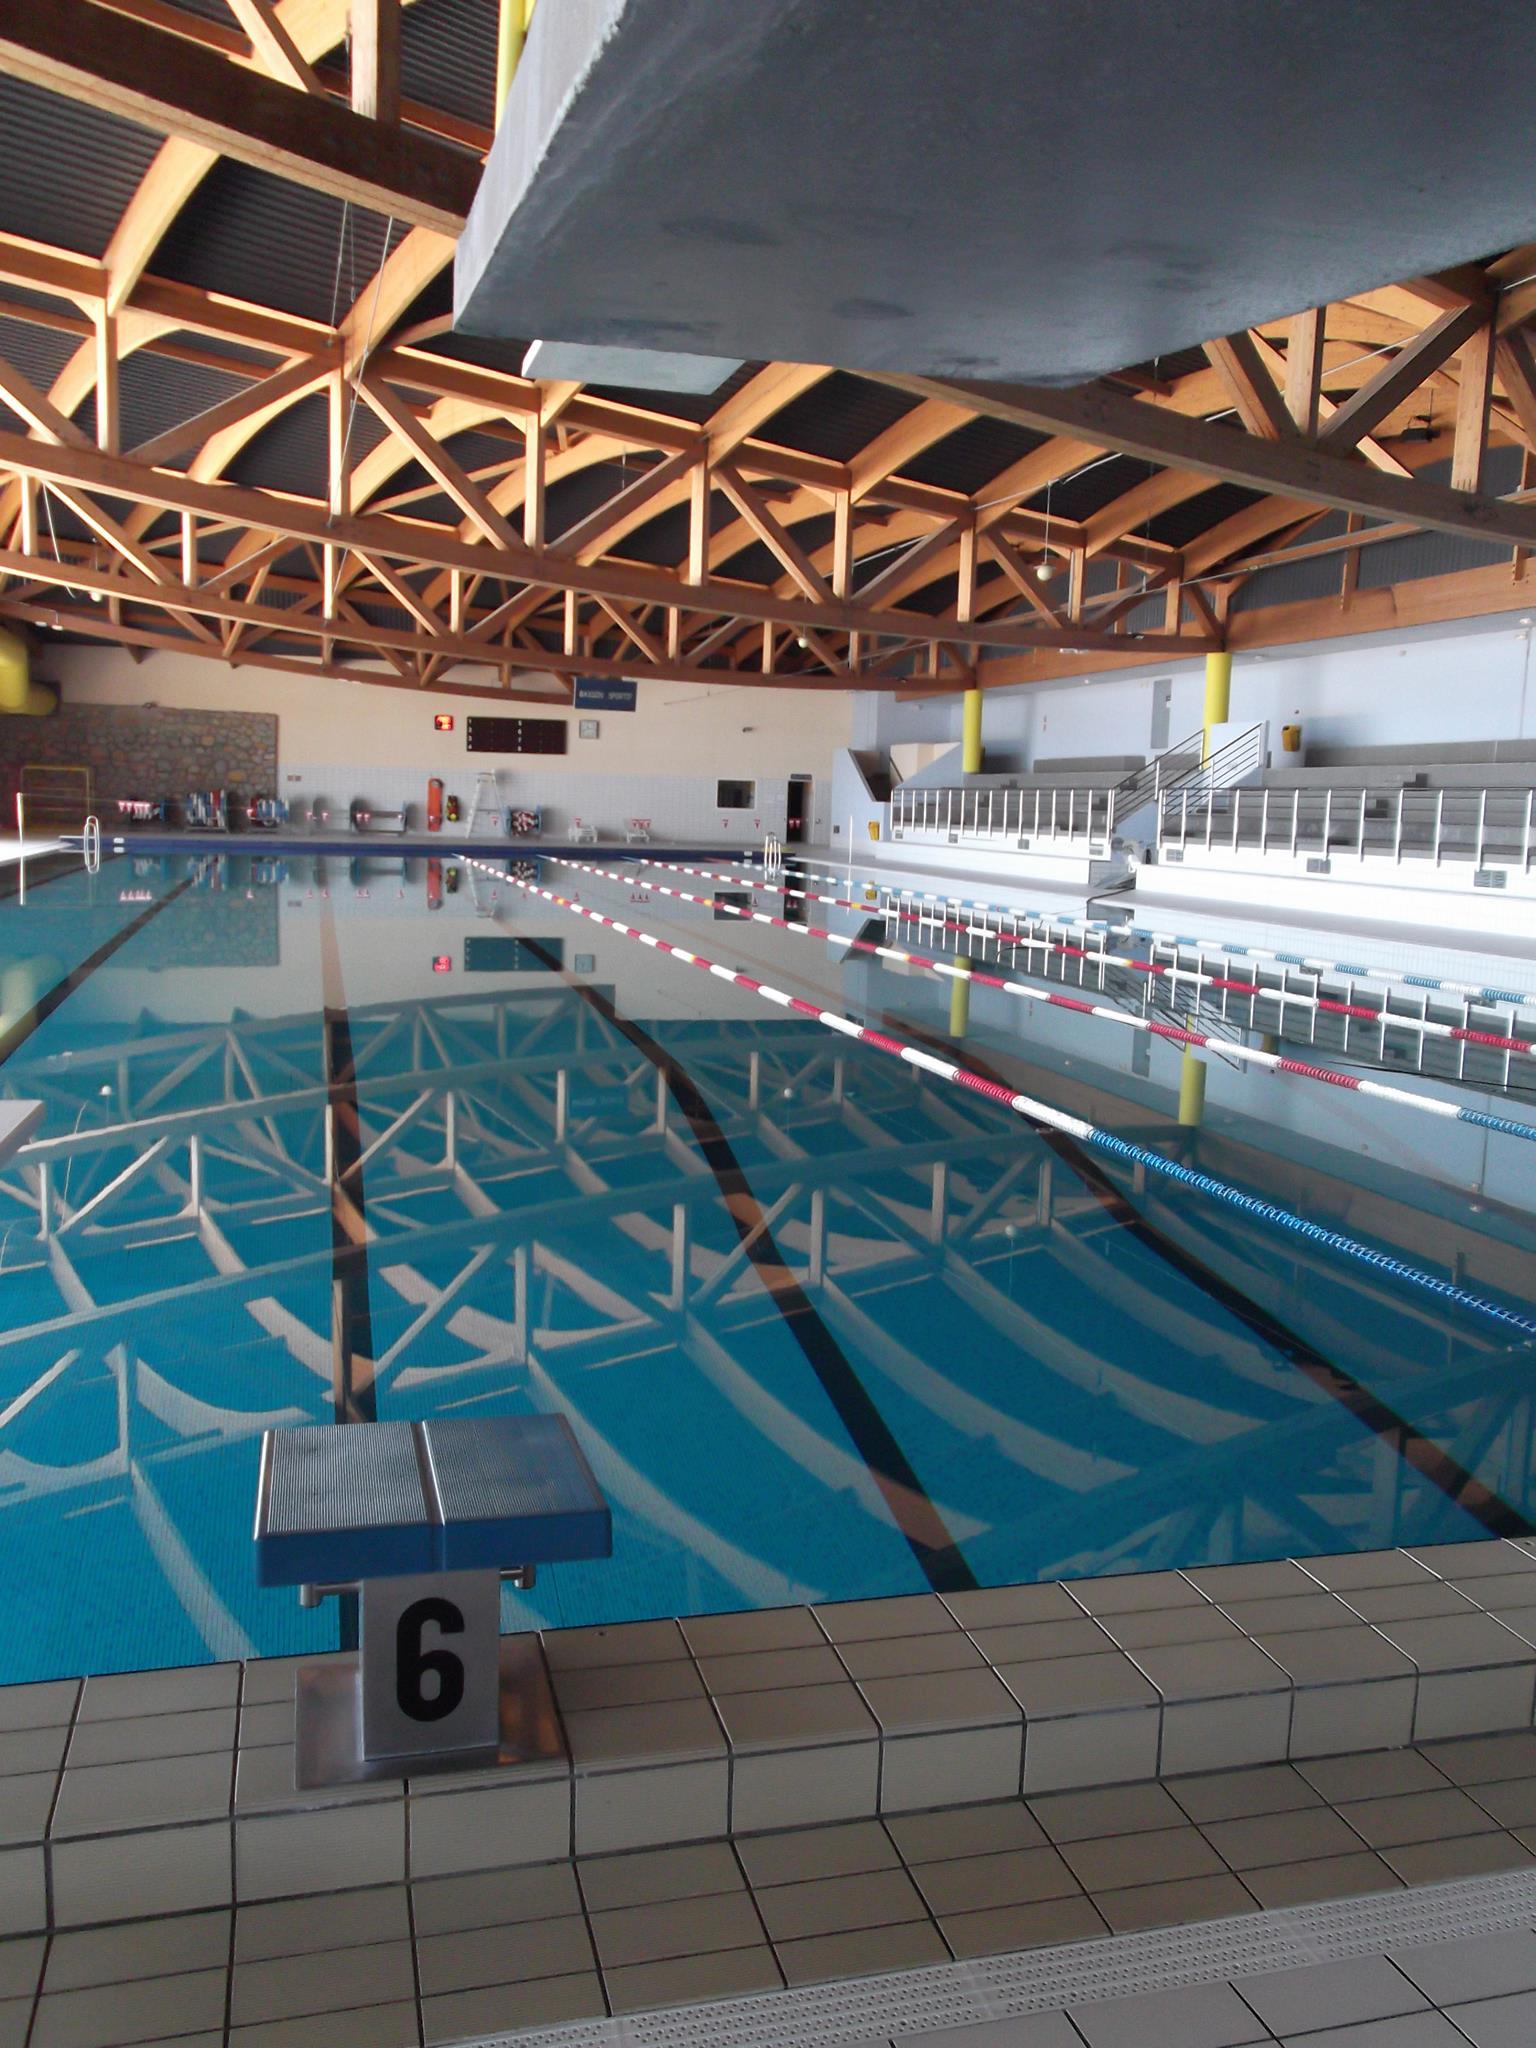 Espace Aquatique Moulin A Vent | Perpignan | Swimming-Pool dedans Horaire Piscine Moulin A Vent